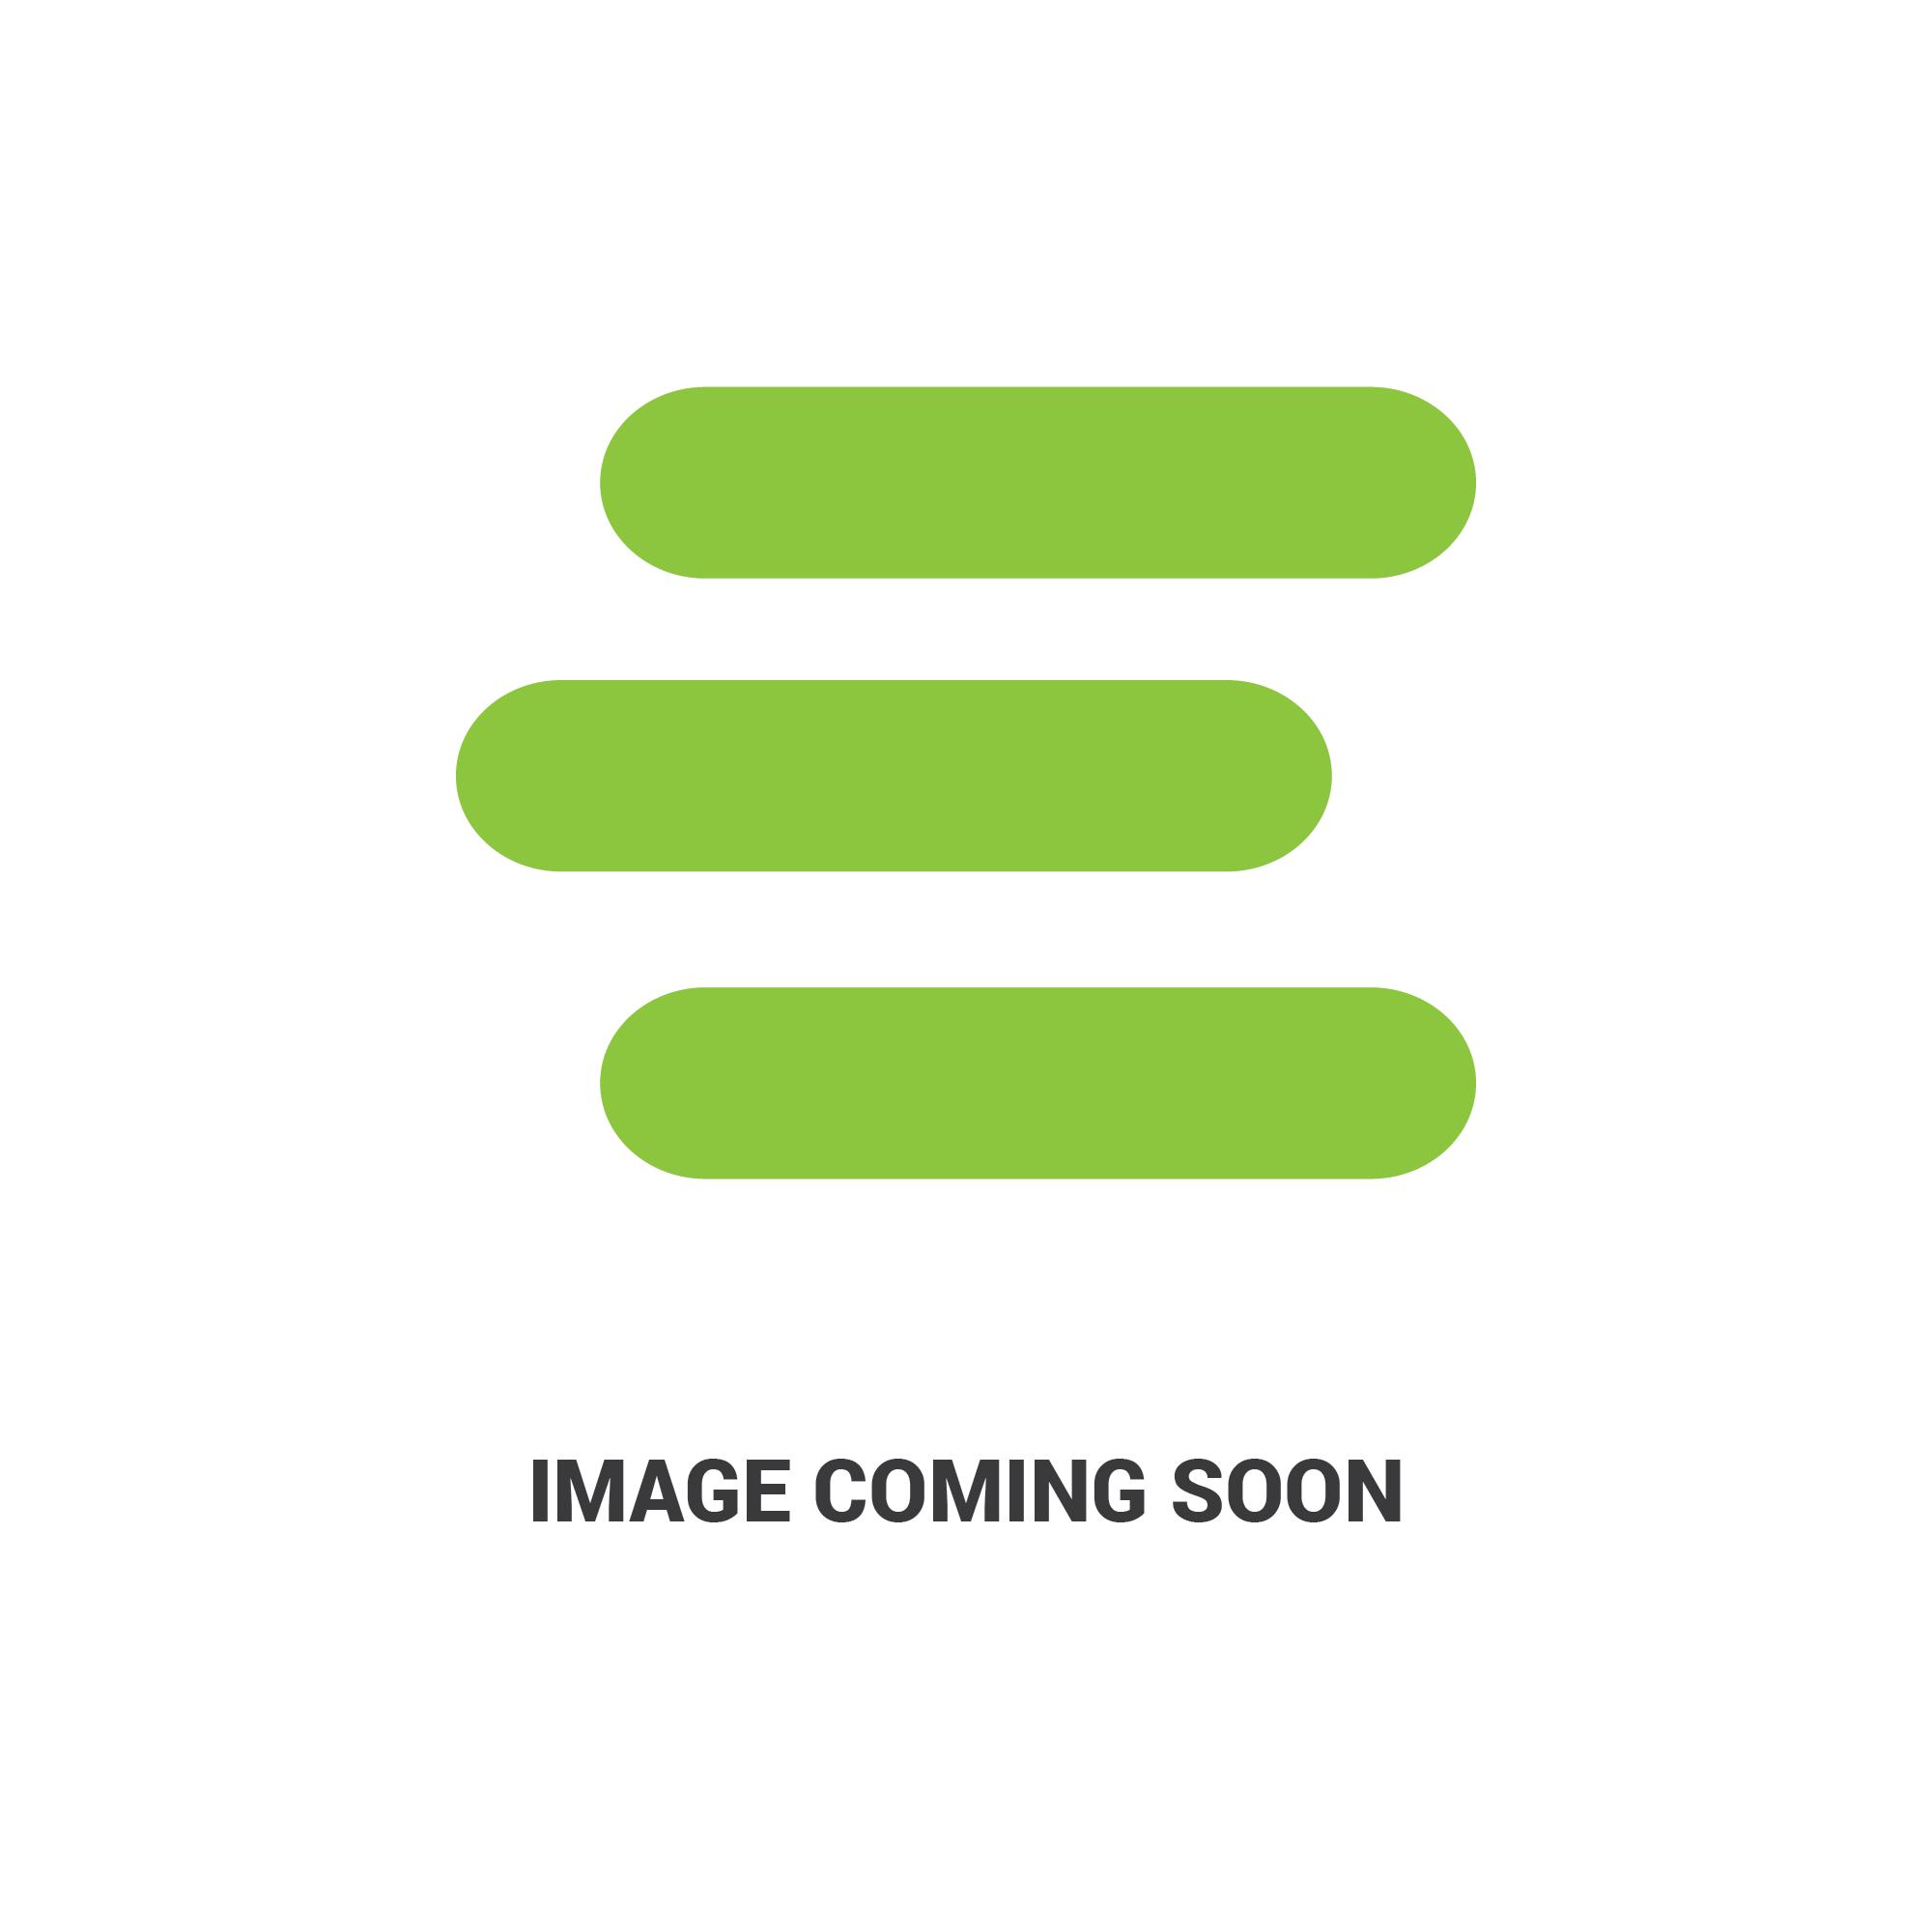 E-15841-39010996_1.jpg